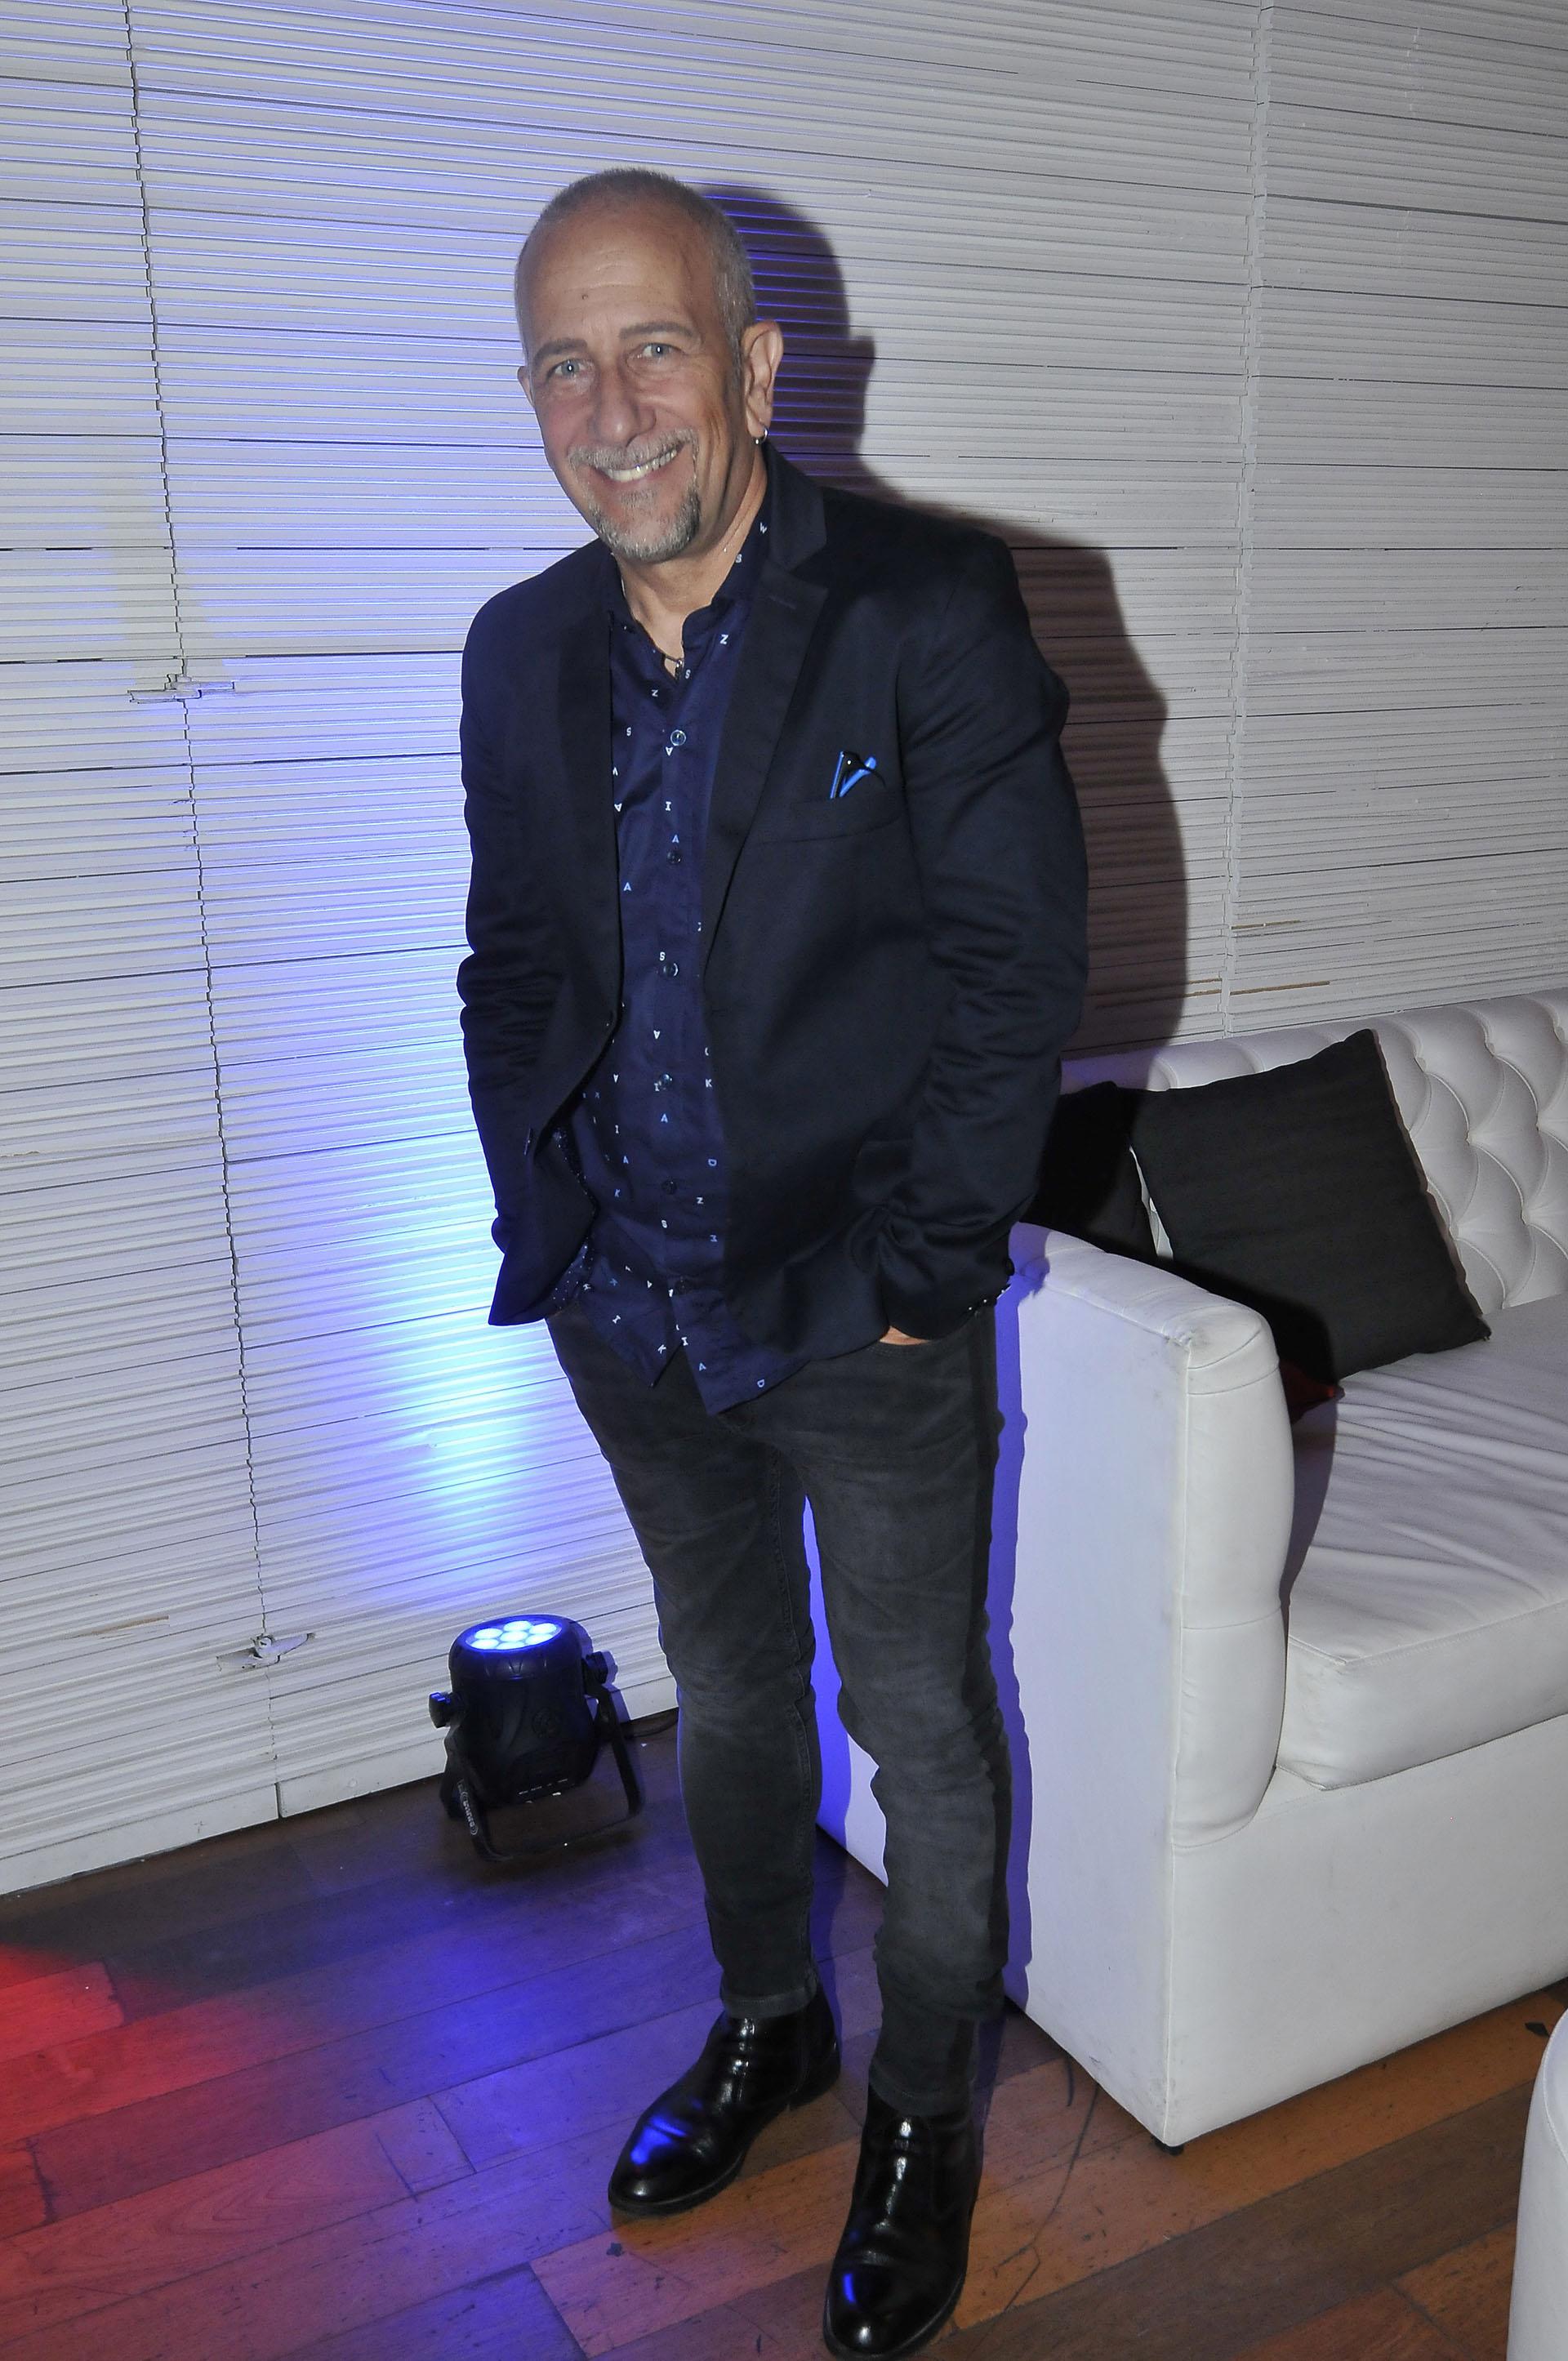 Mariano Argento (Crédito de Fotos: Teleshow)